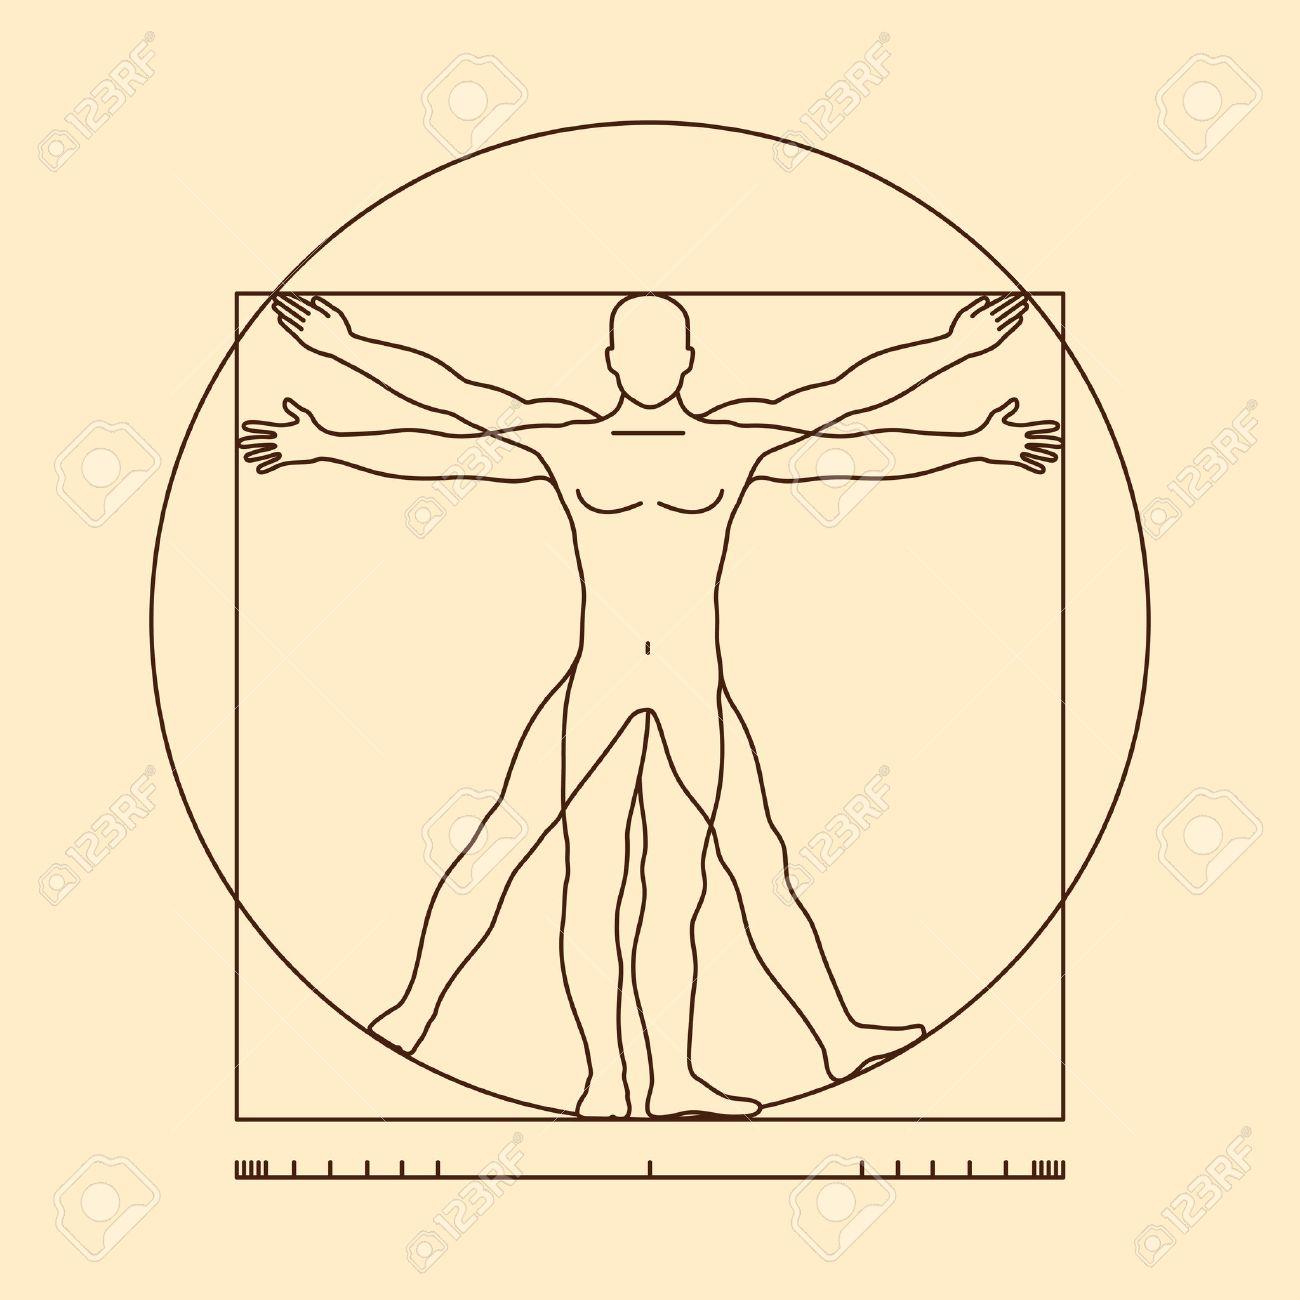 Leonardo Da Vinci Vitruvian Man Vector Illustration Of Vitruvian